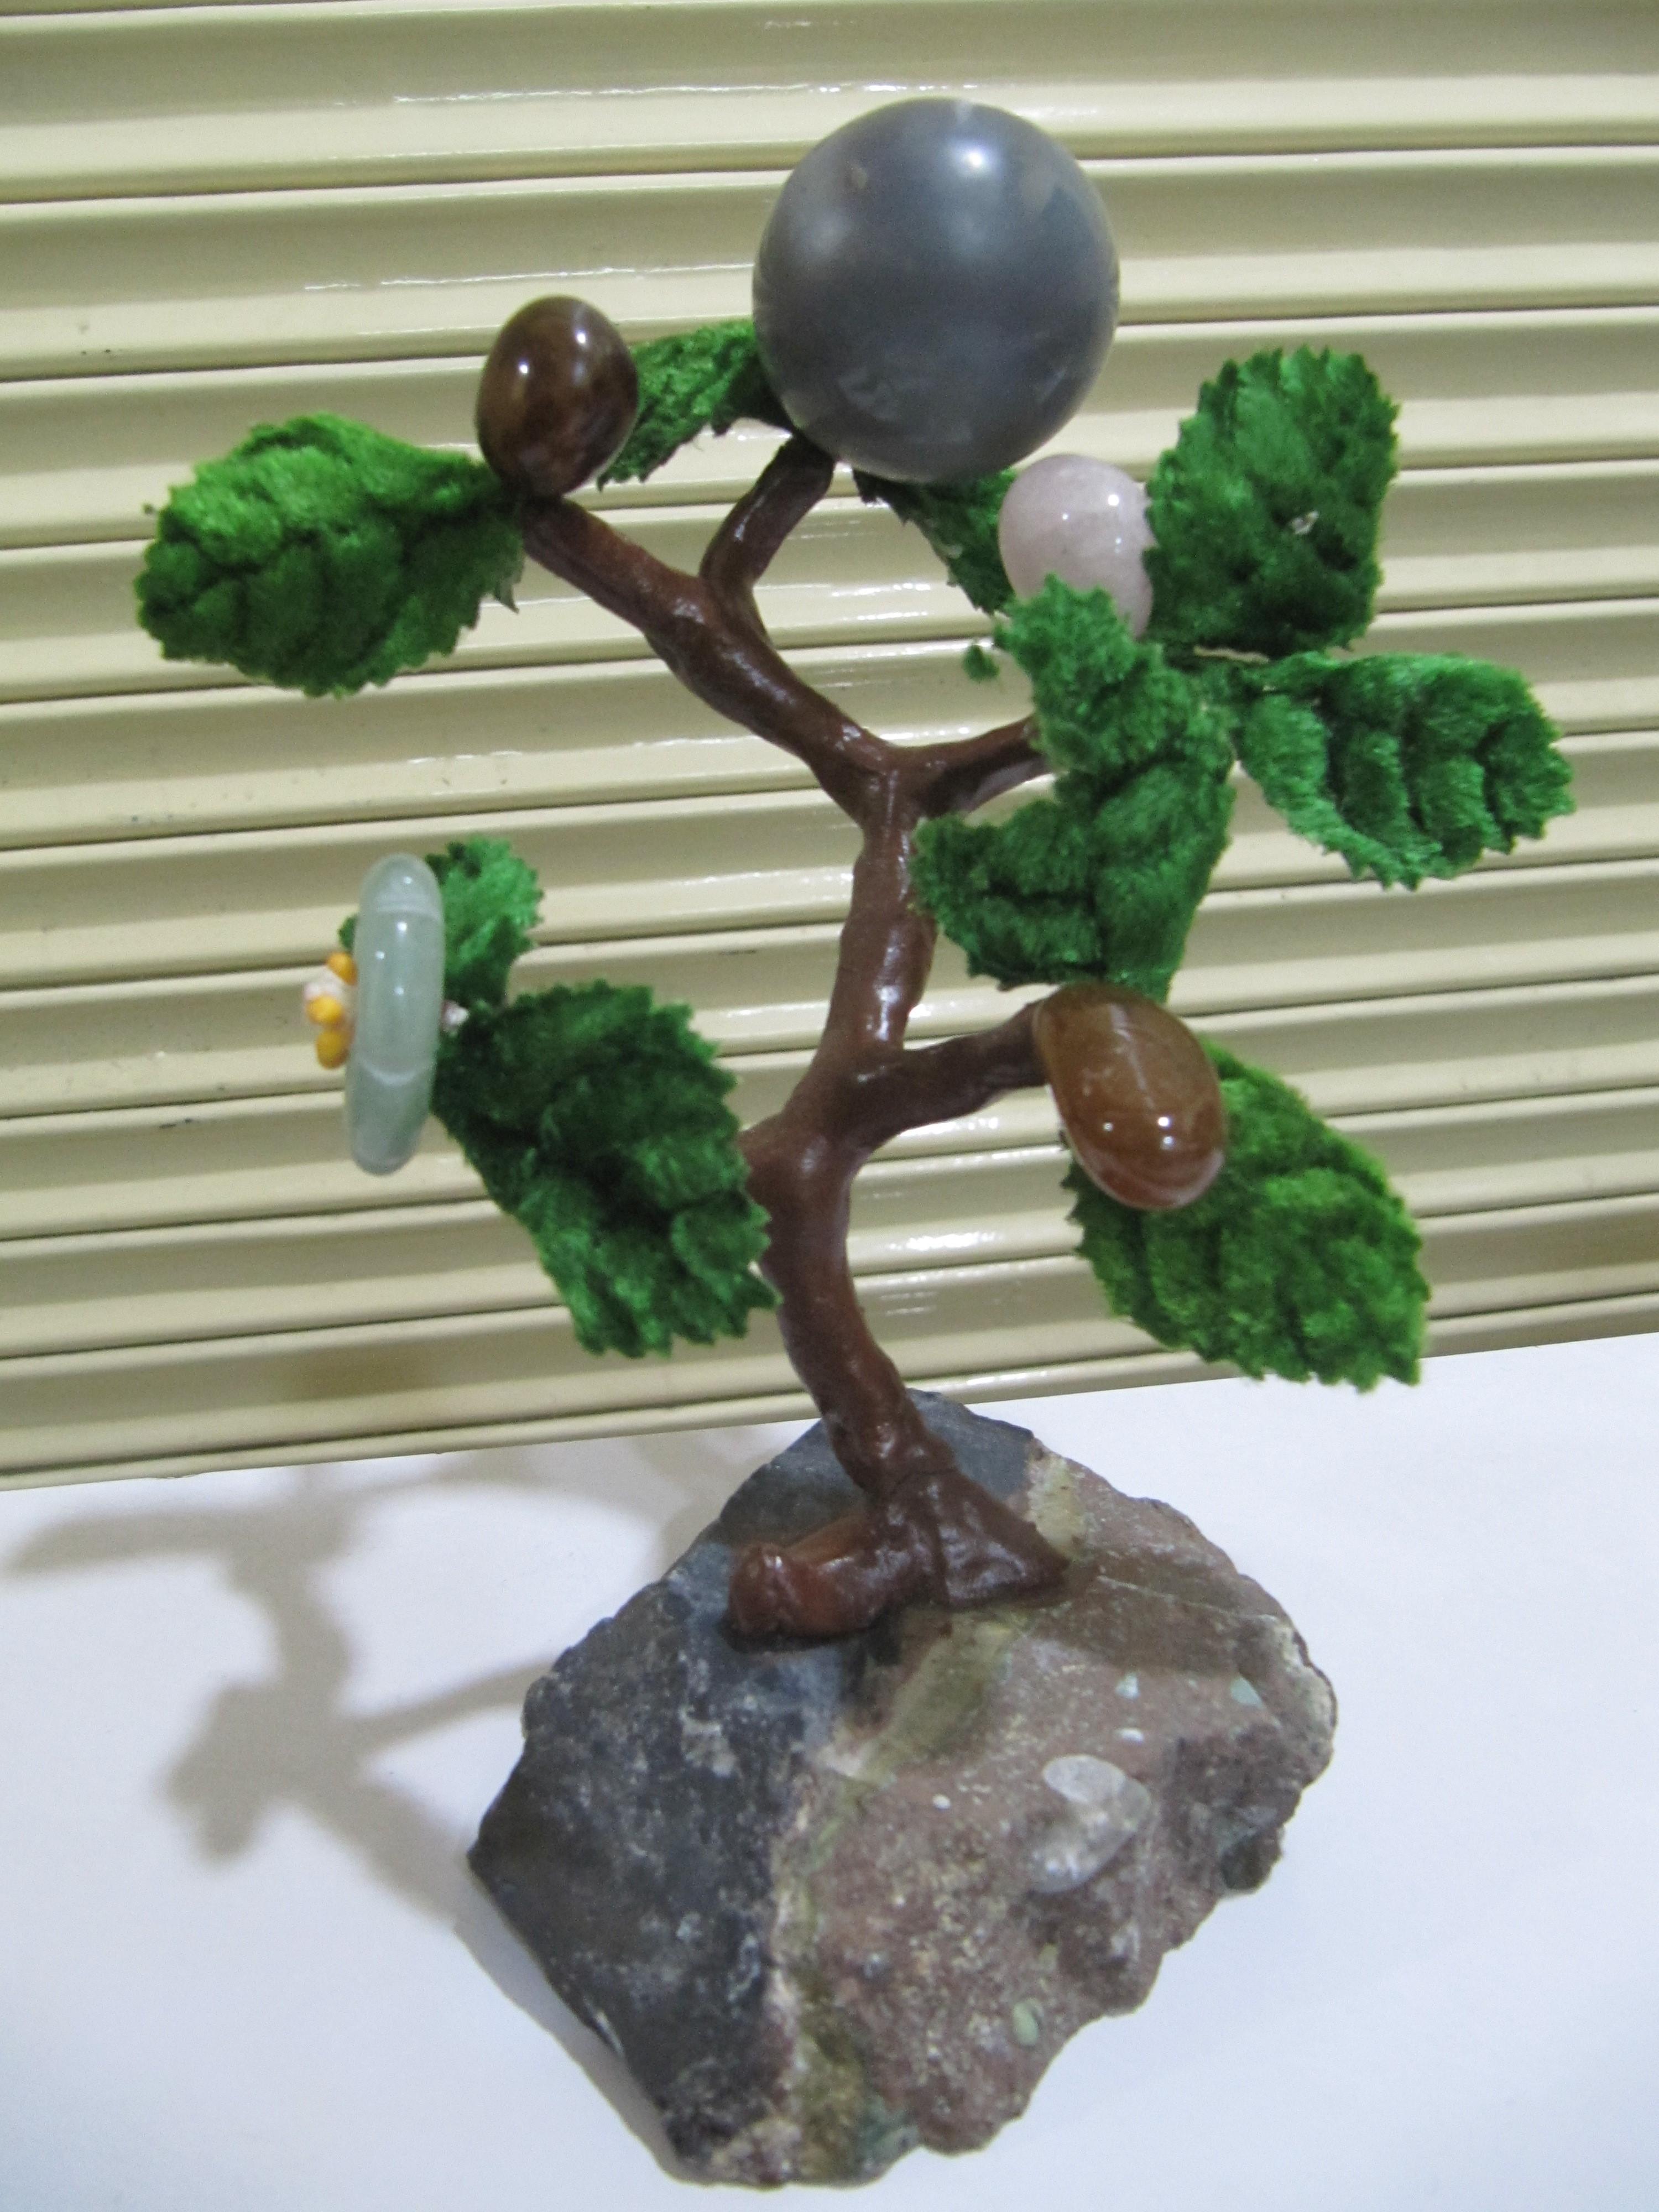 Harmonize Multi Healing Stone Tree Spritual Table Decor Office Gift 6-7 inches Long.